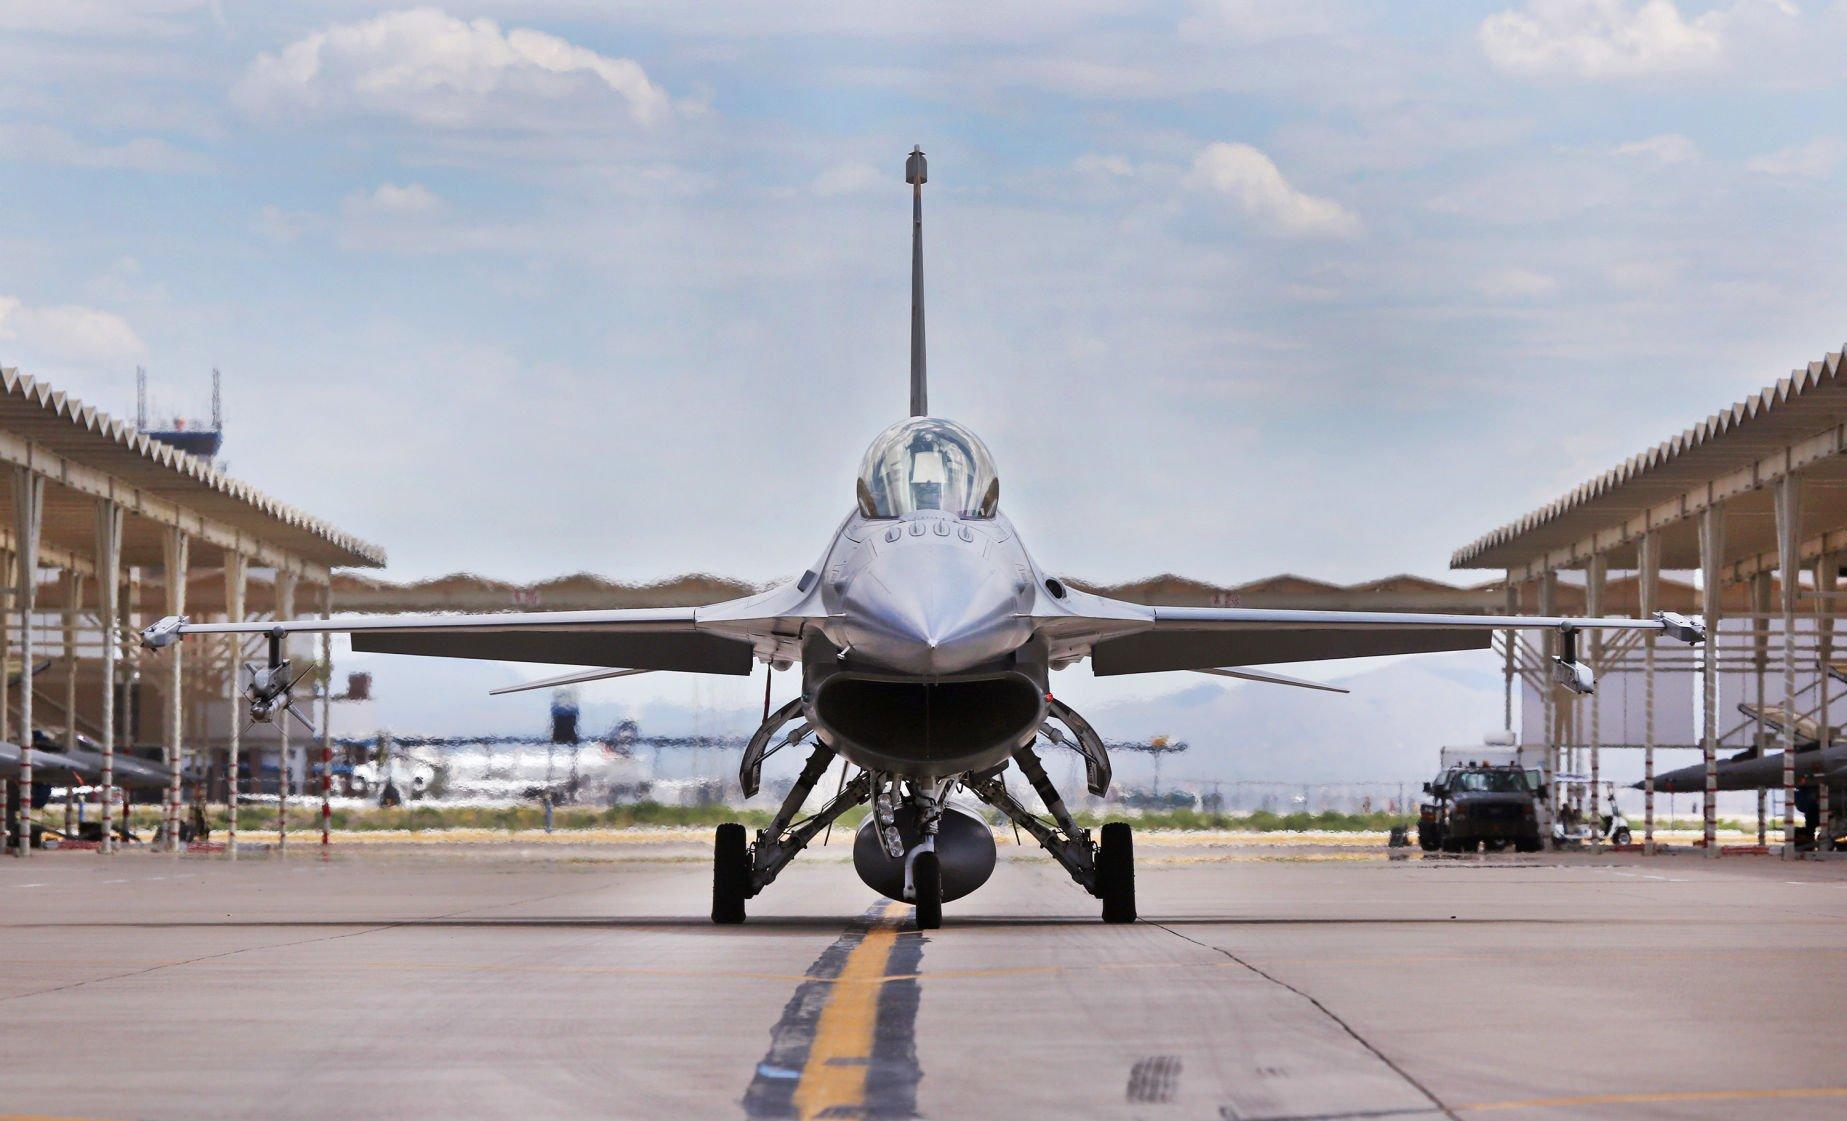 Arizona Air National Guard says F-16 crashes near Safford